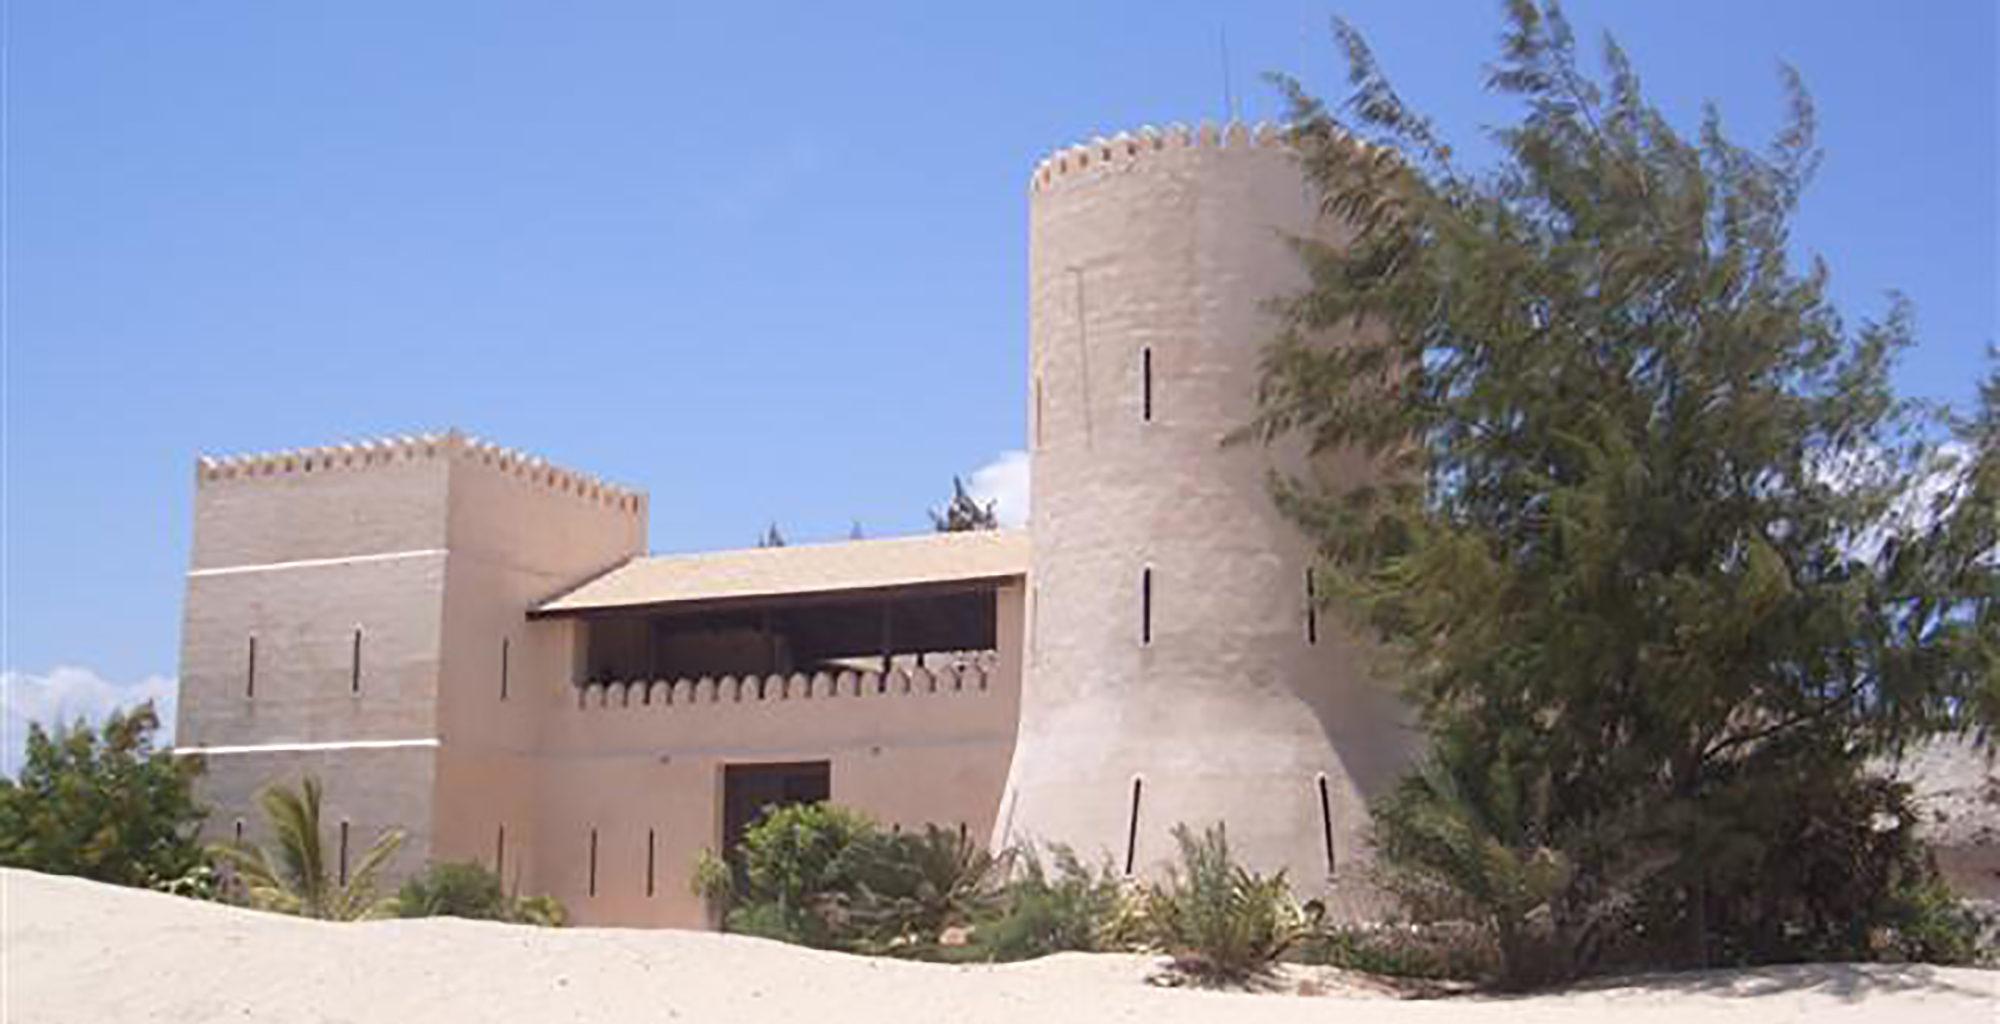 Kenya-The-Fort-Exterior